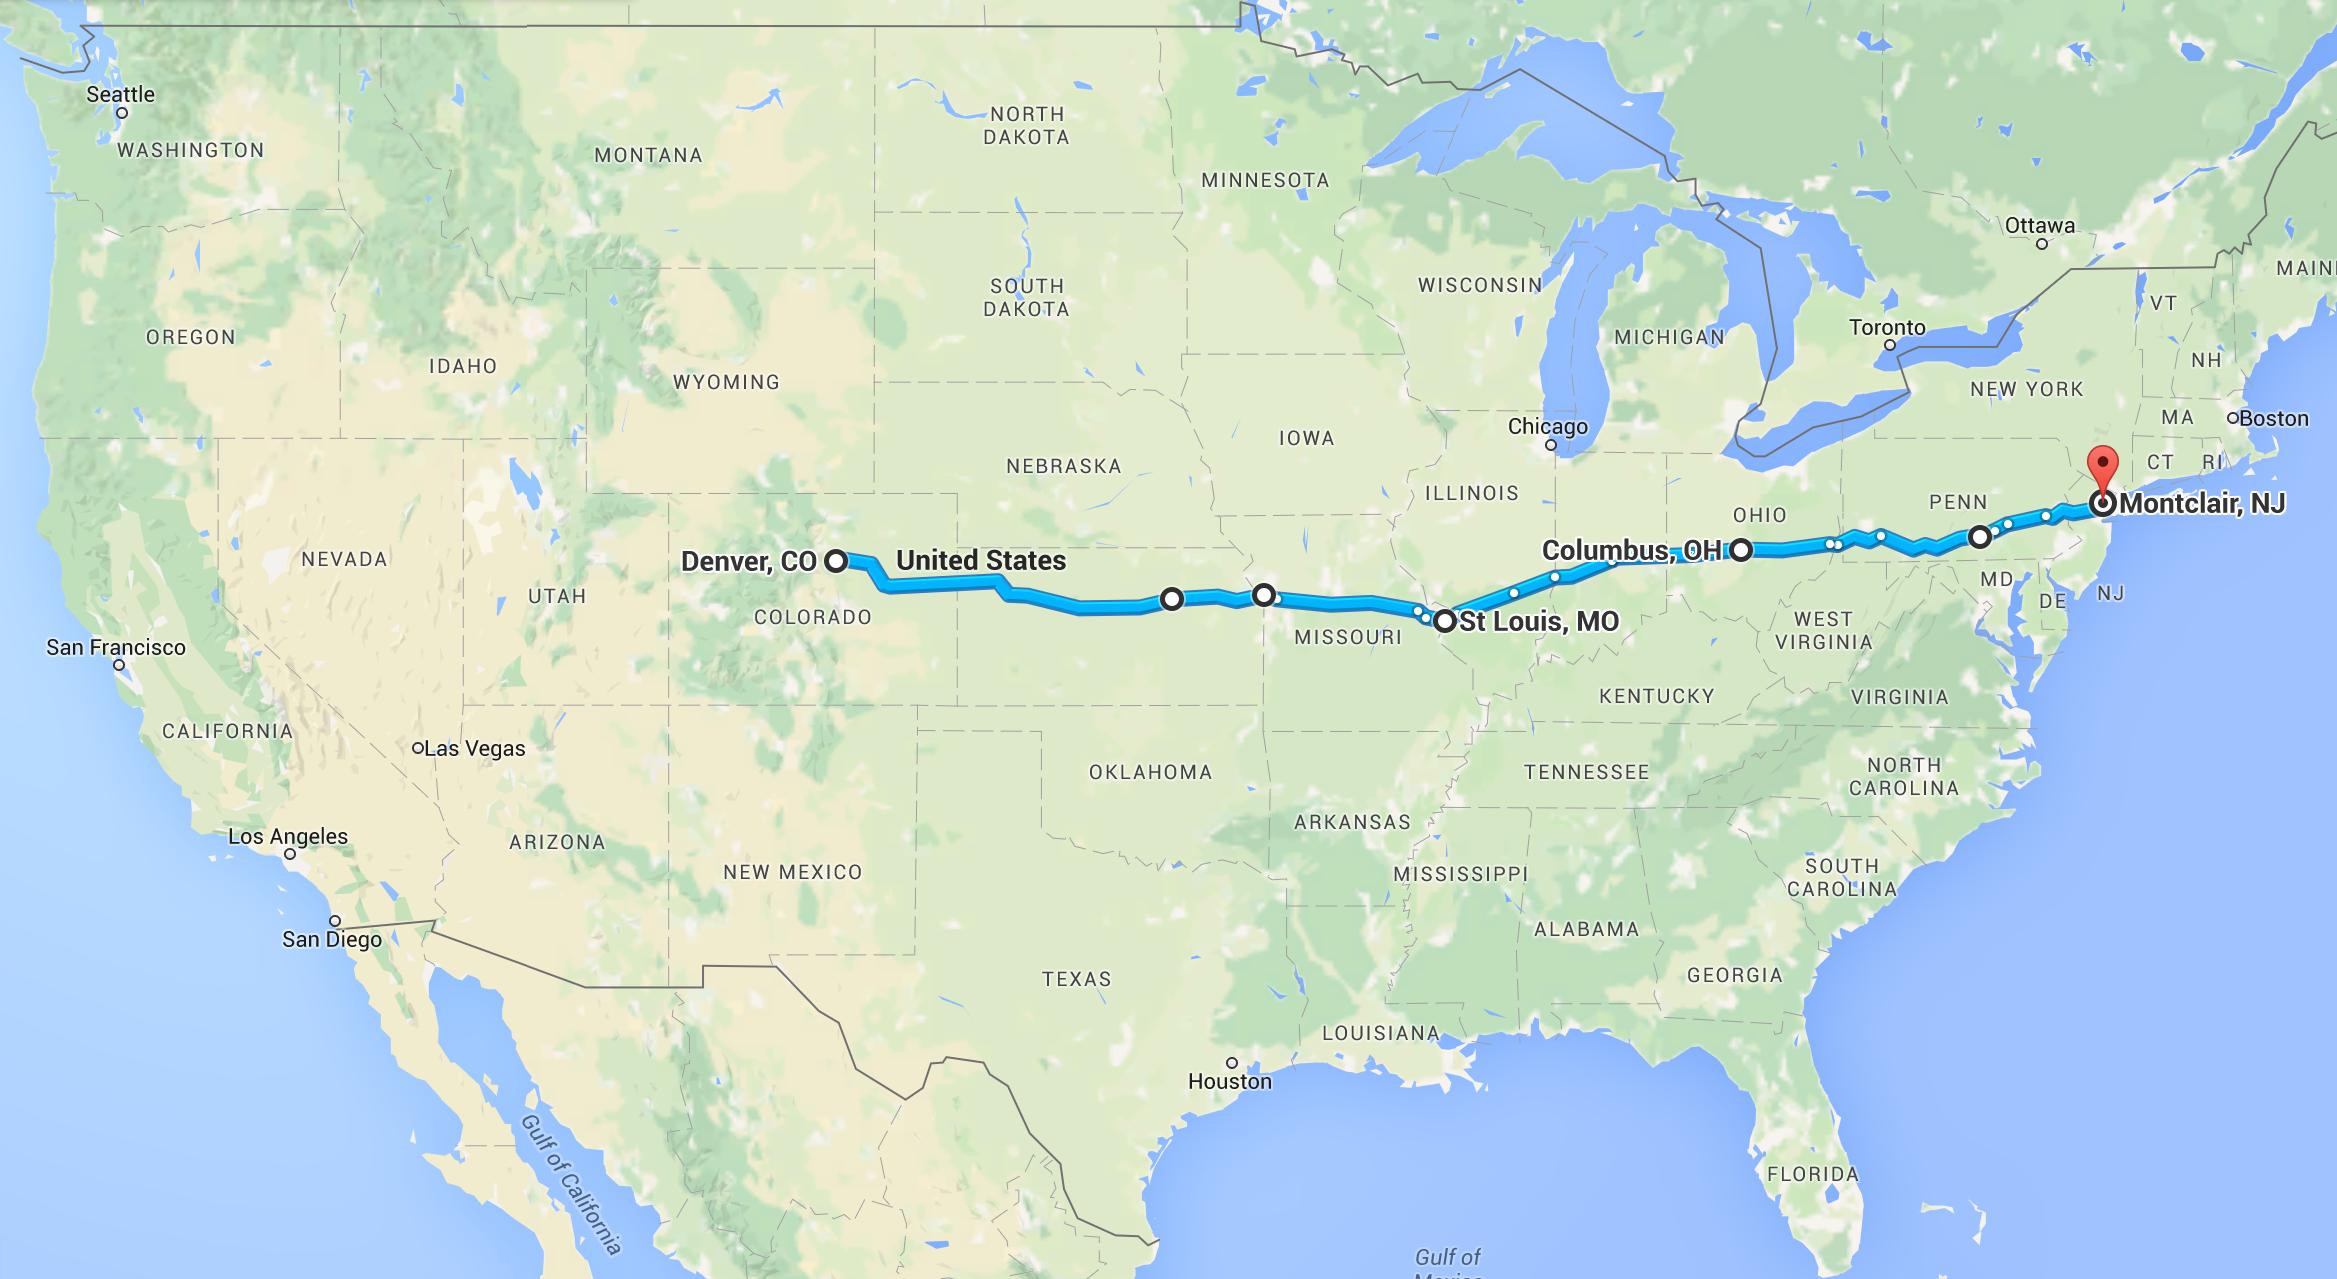 Our return trip route.